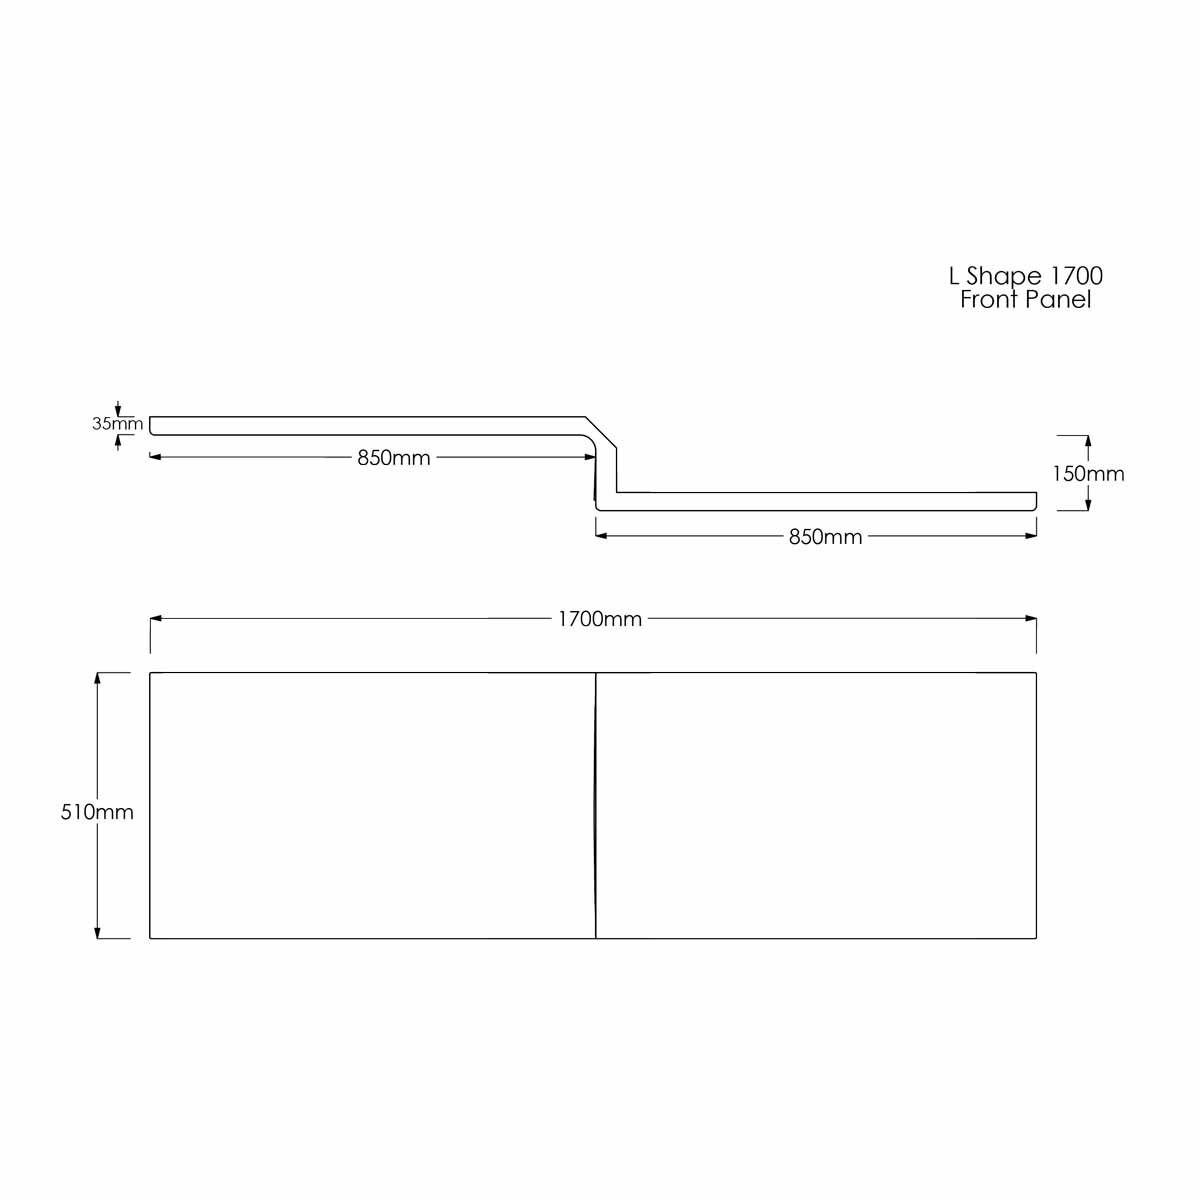 Solarna L Shape Shower Bath Panel Dimensions